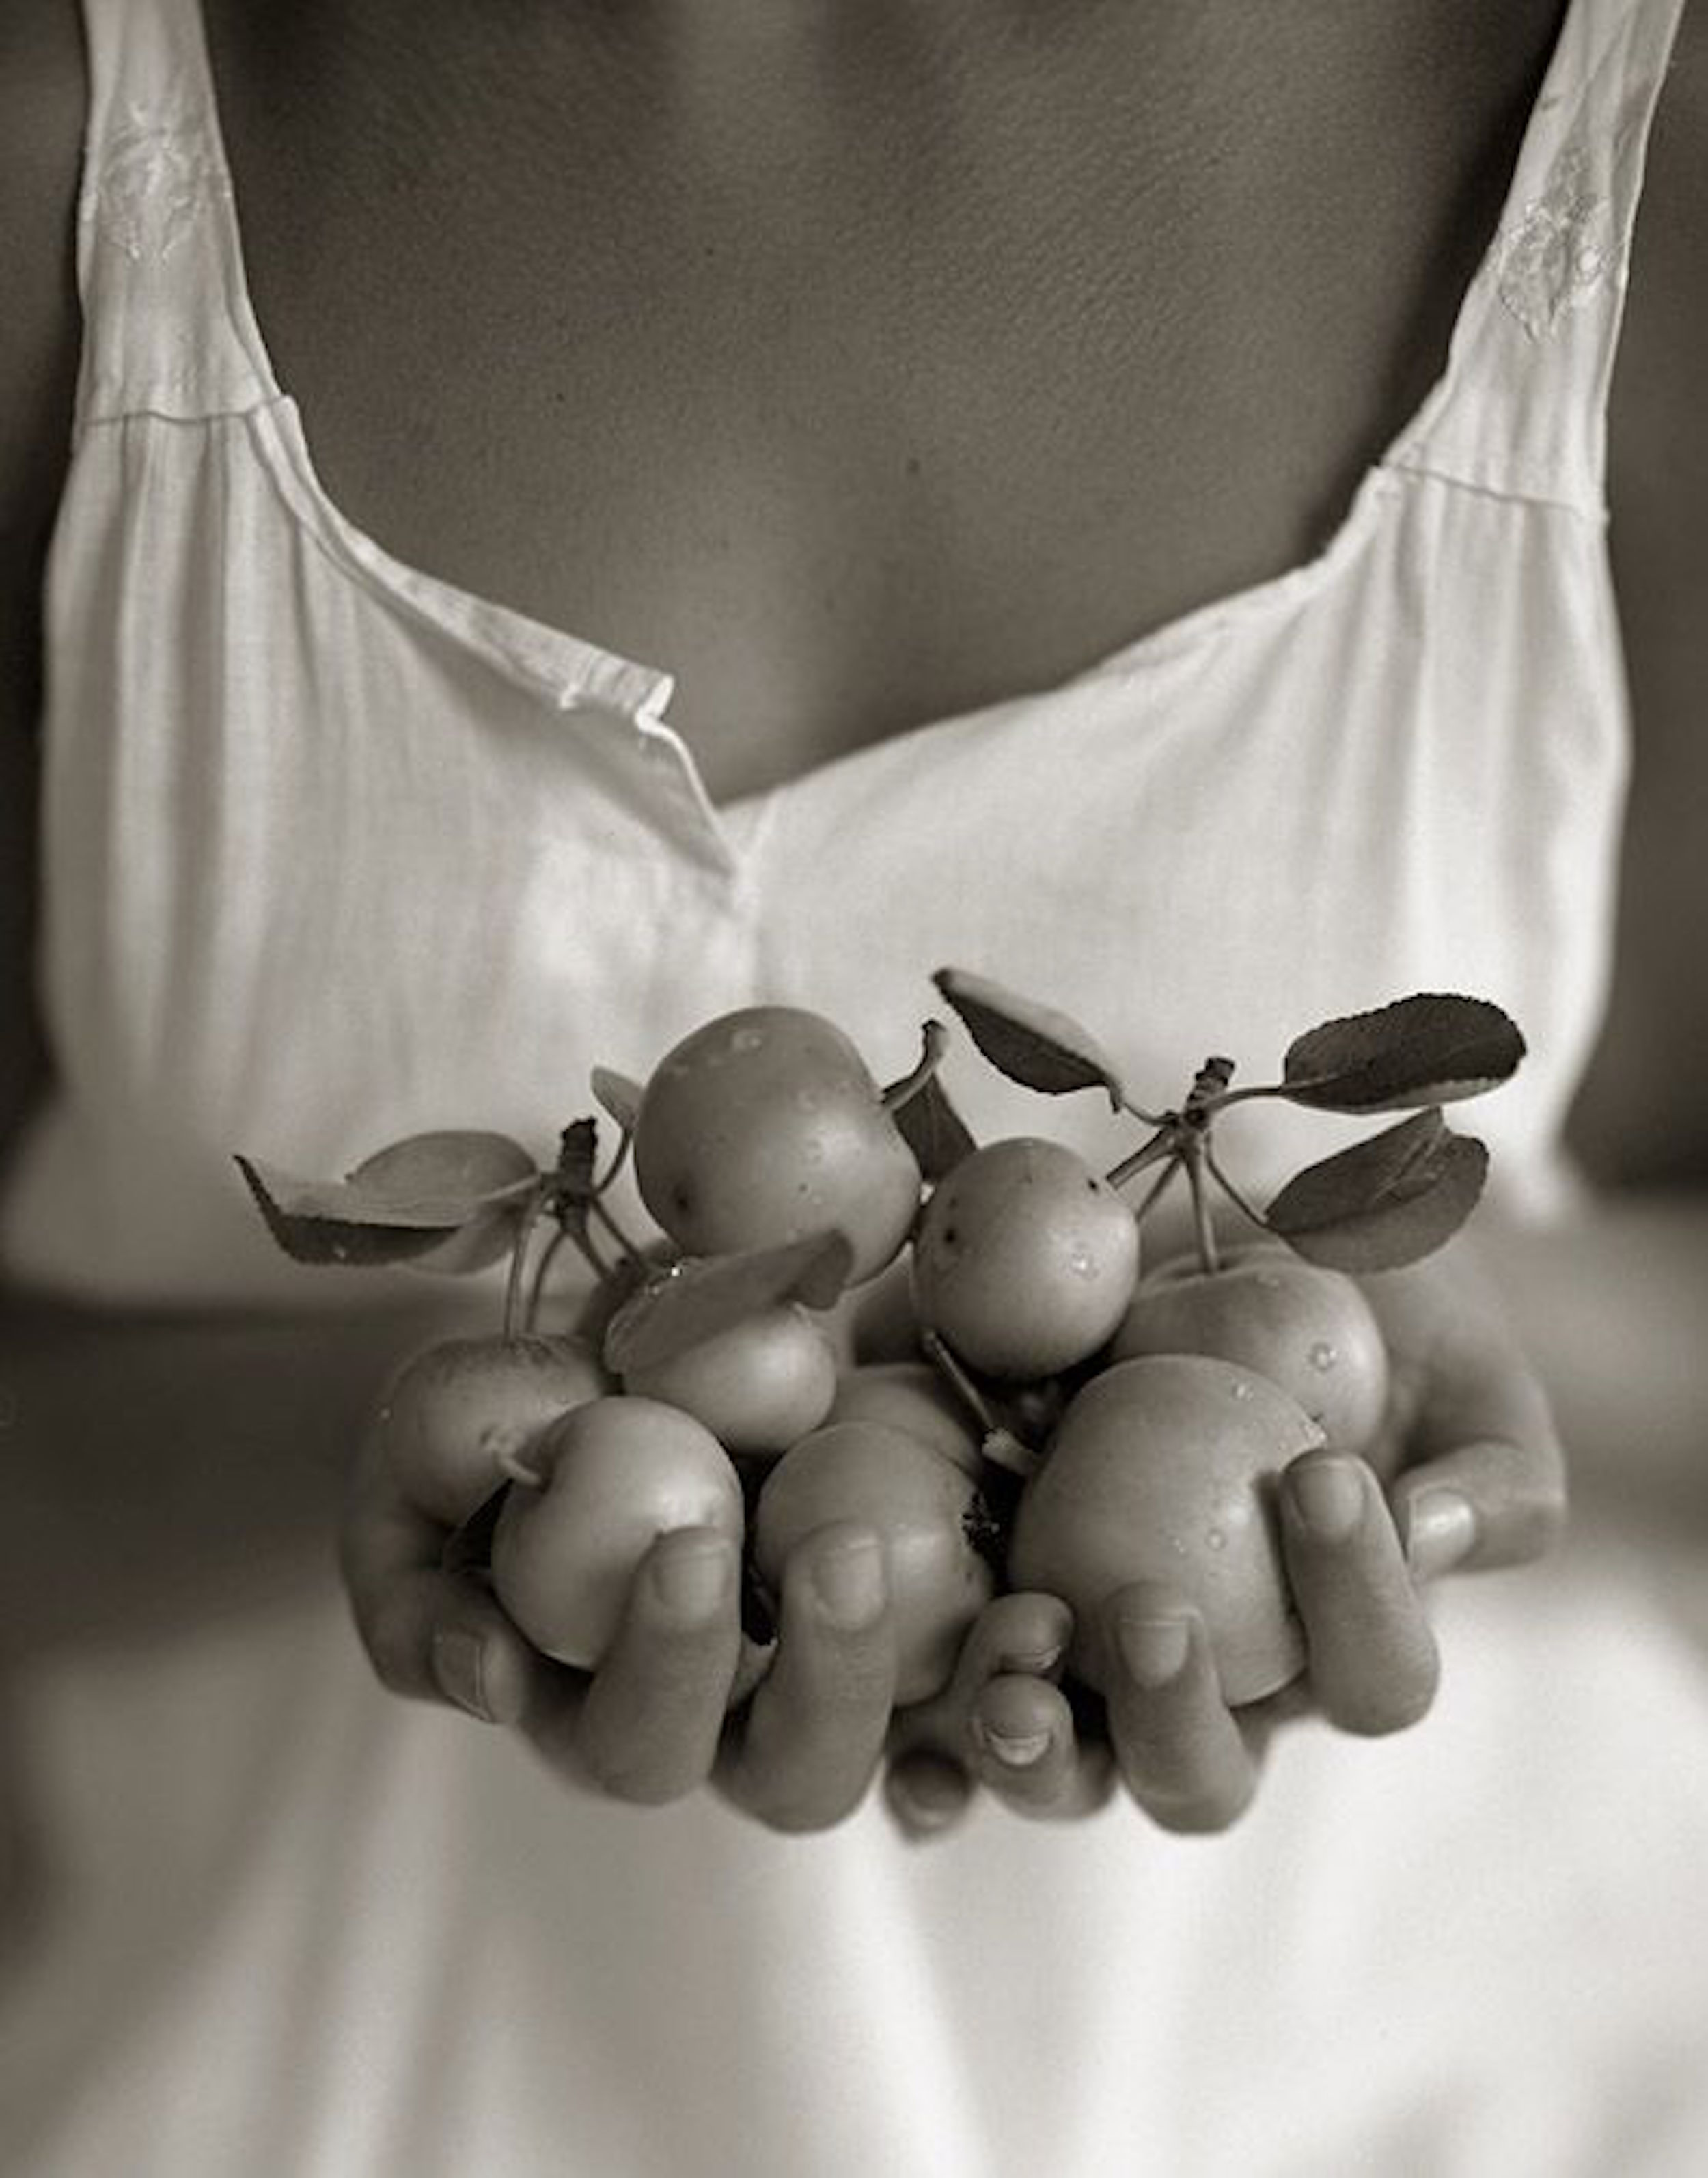 Small apples 1984.jpg